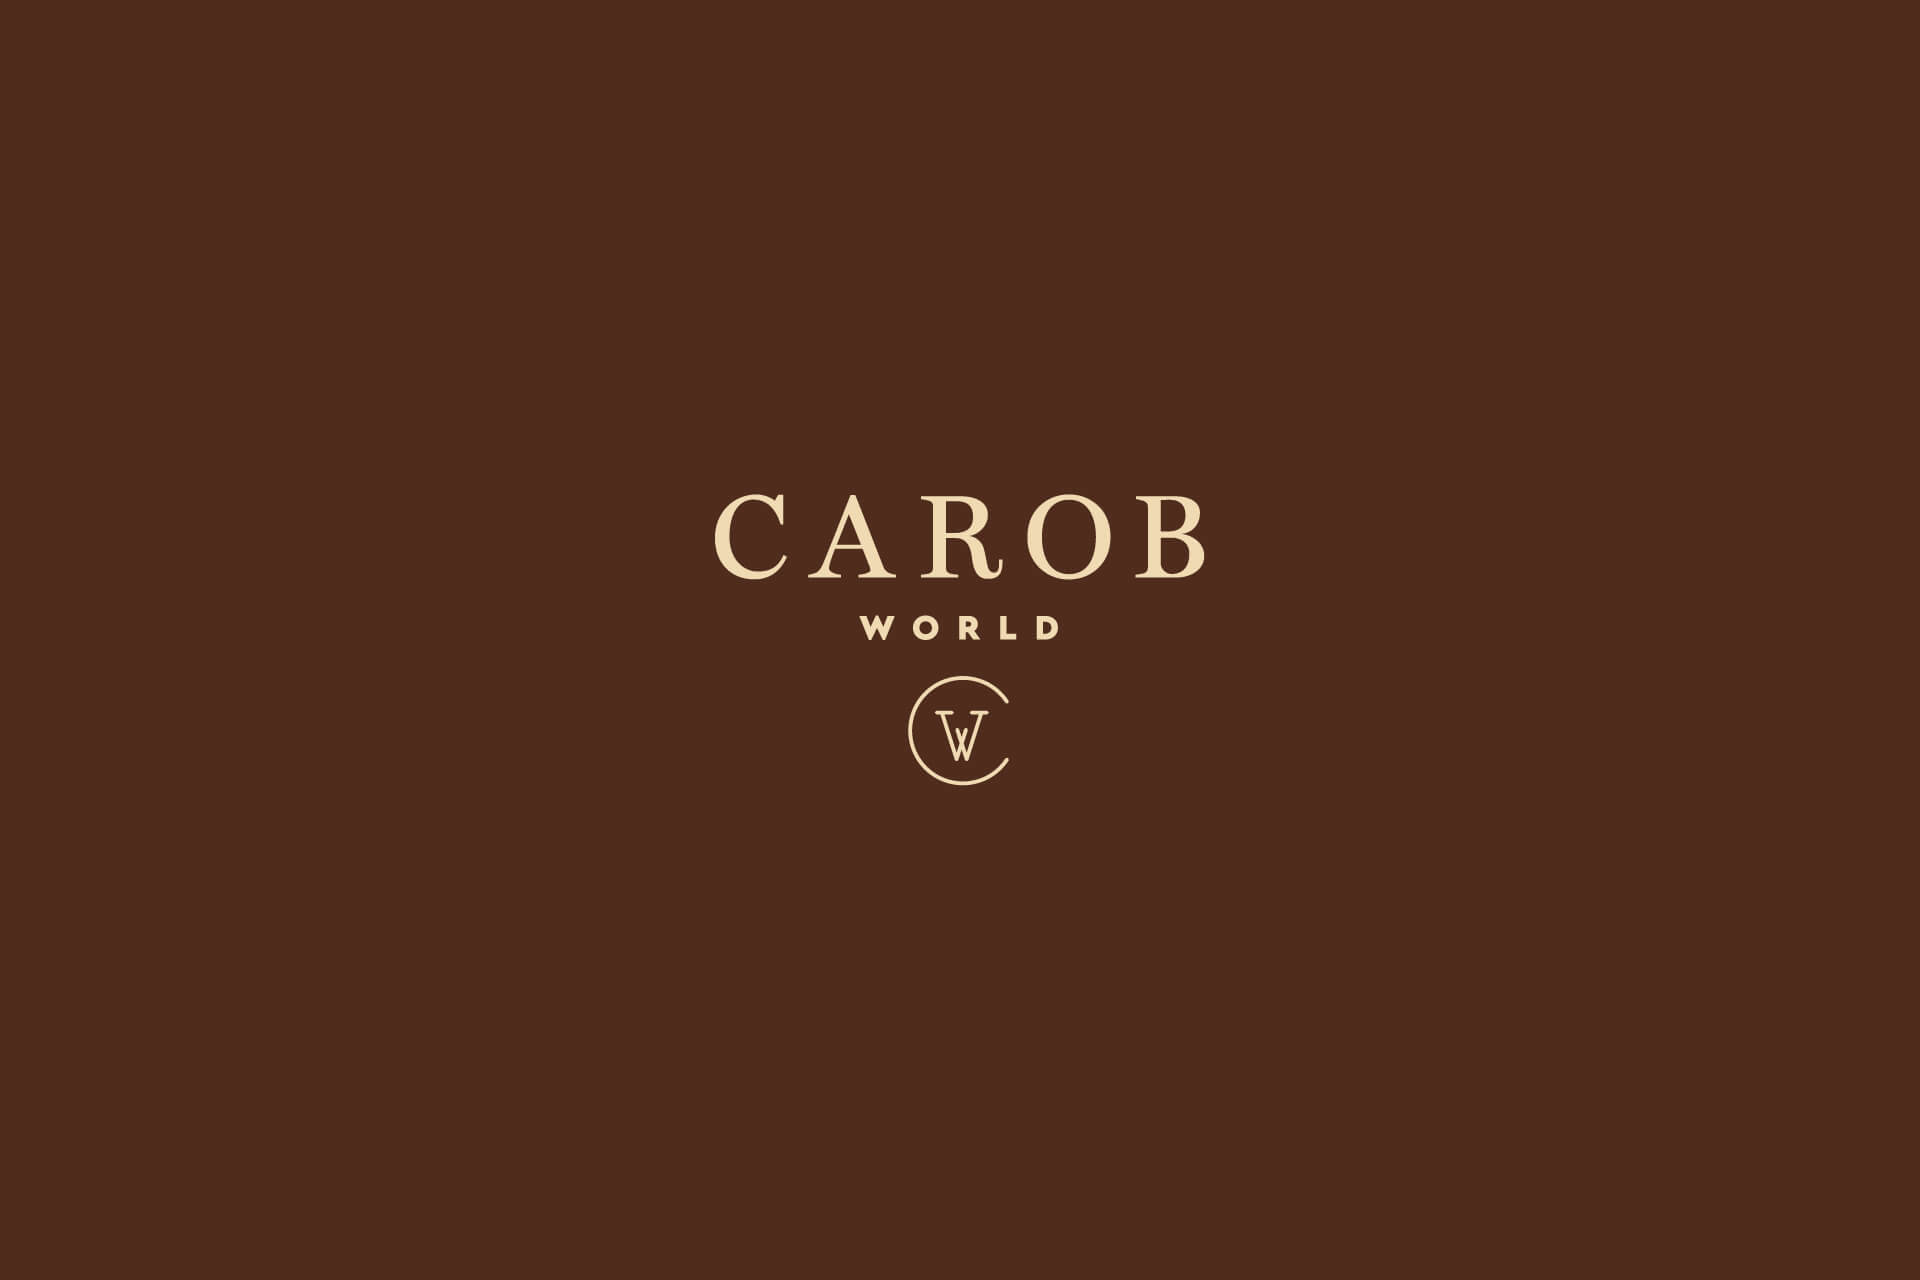 Carob_Branding_1